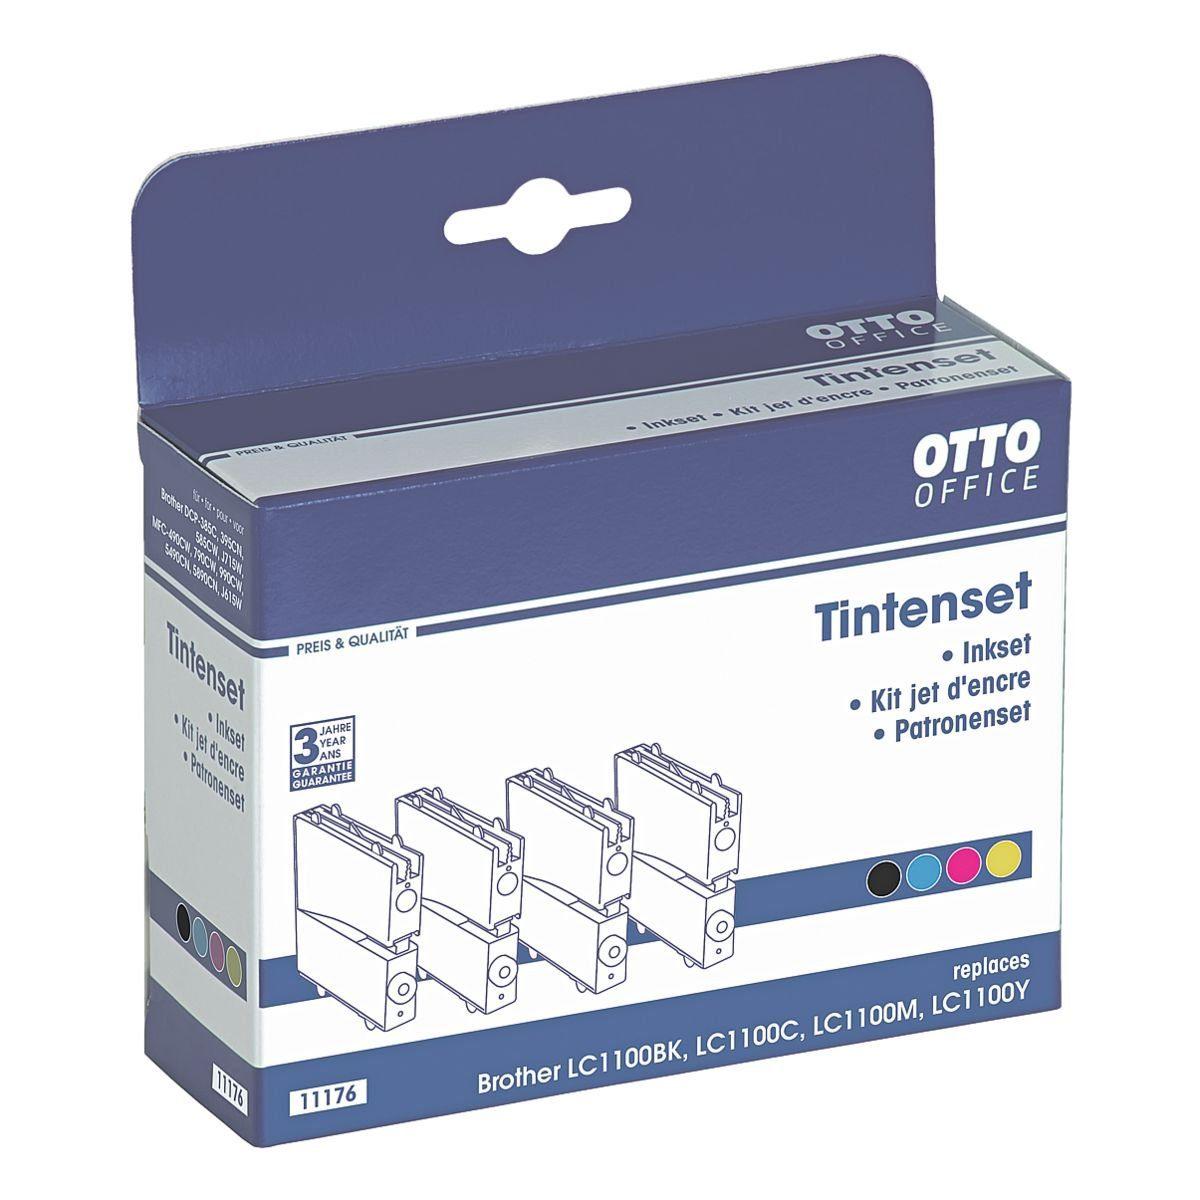 OTTO Office Standard Tintenpatronen-Set ersetzt Brother »LC-1100«